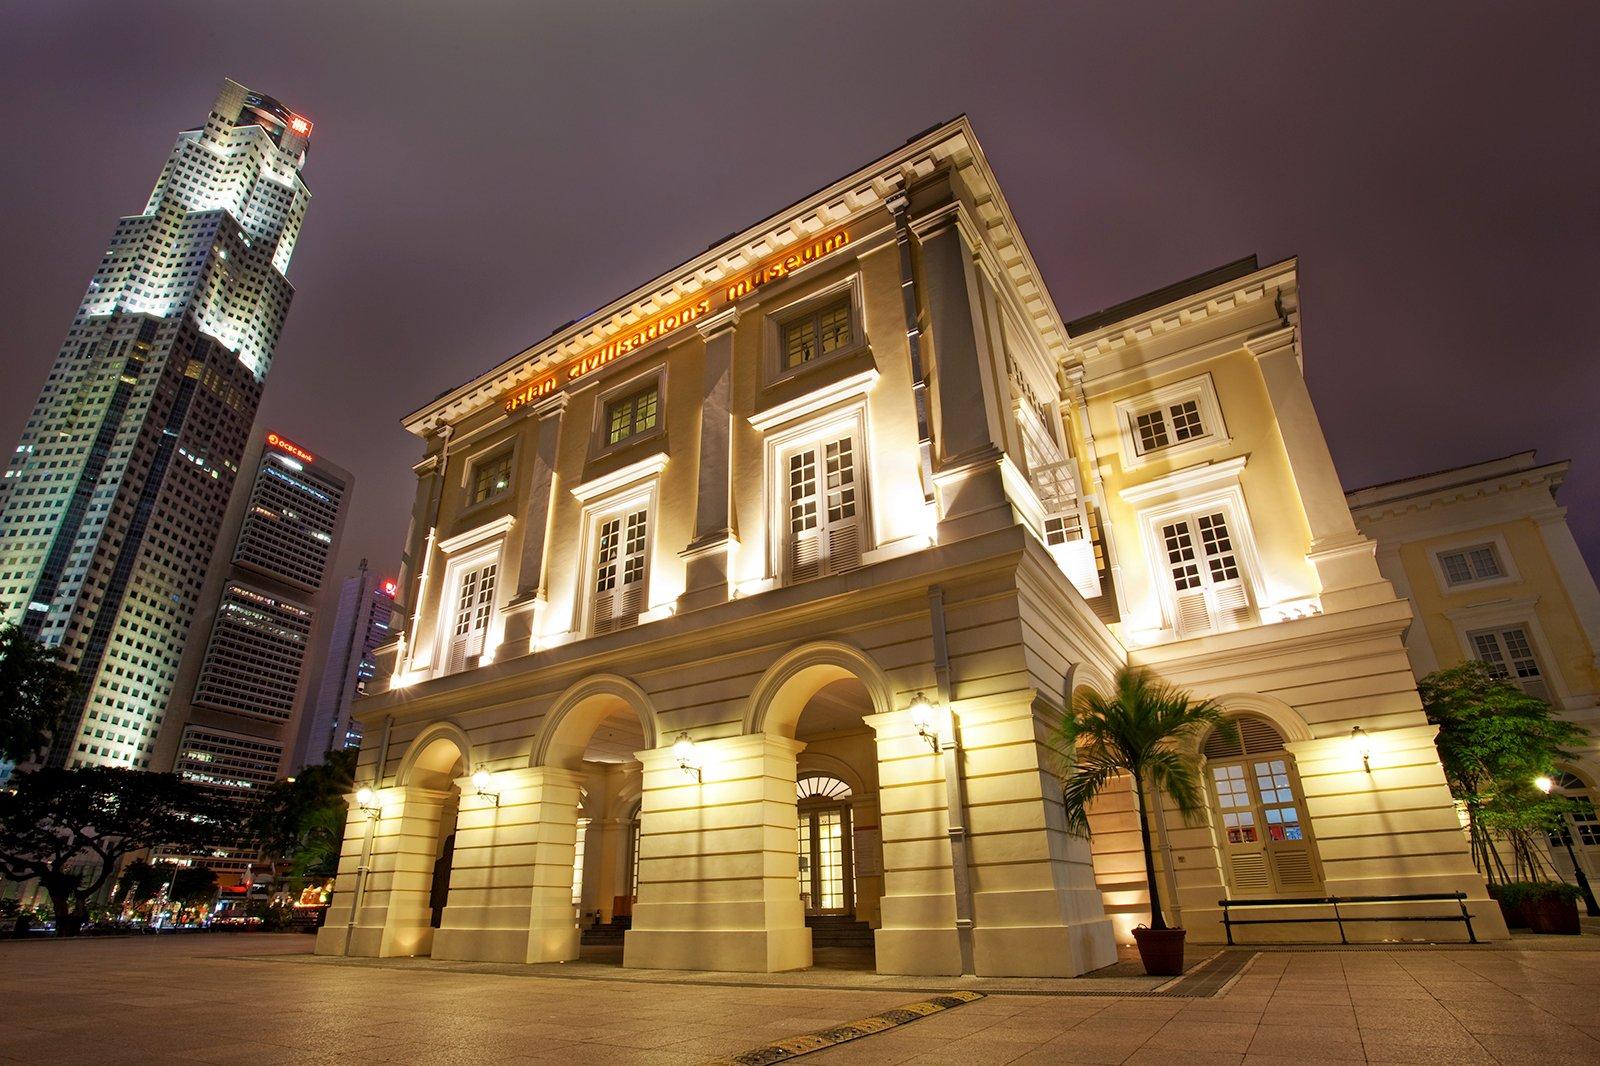 Asian Civilisations Museum in Singapore - Singapore Attractions